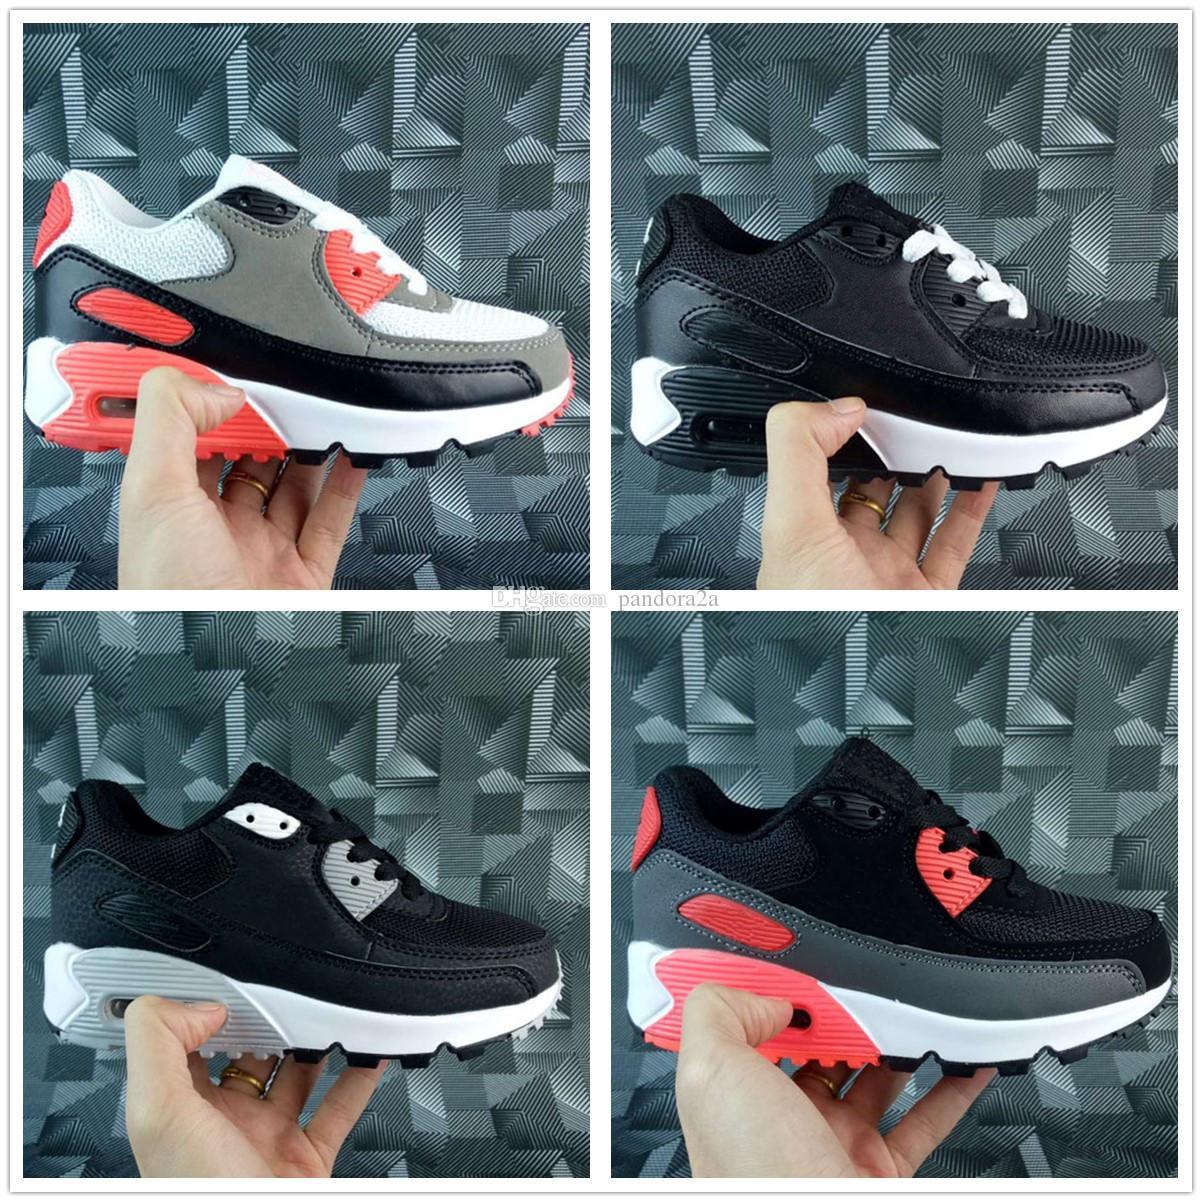 sale retailer 16f11 203e2 Acquista Nike Air Max Airmax 90 Scarpe Da Ginnastica Uomo Scarpe Classiche  Da Uomo E Da Donna 90 Scarpe Da Bambino Nere Scarpe Da Ginnastica Bambini  Scarpe ...